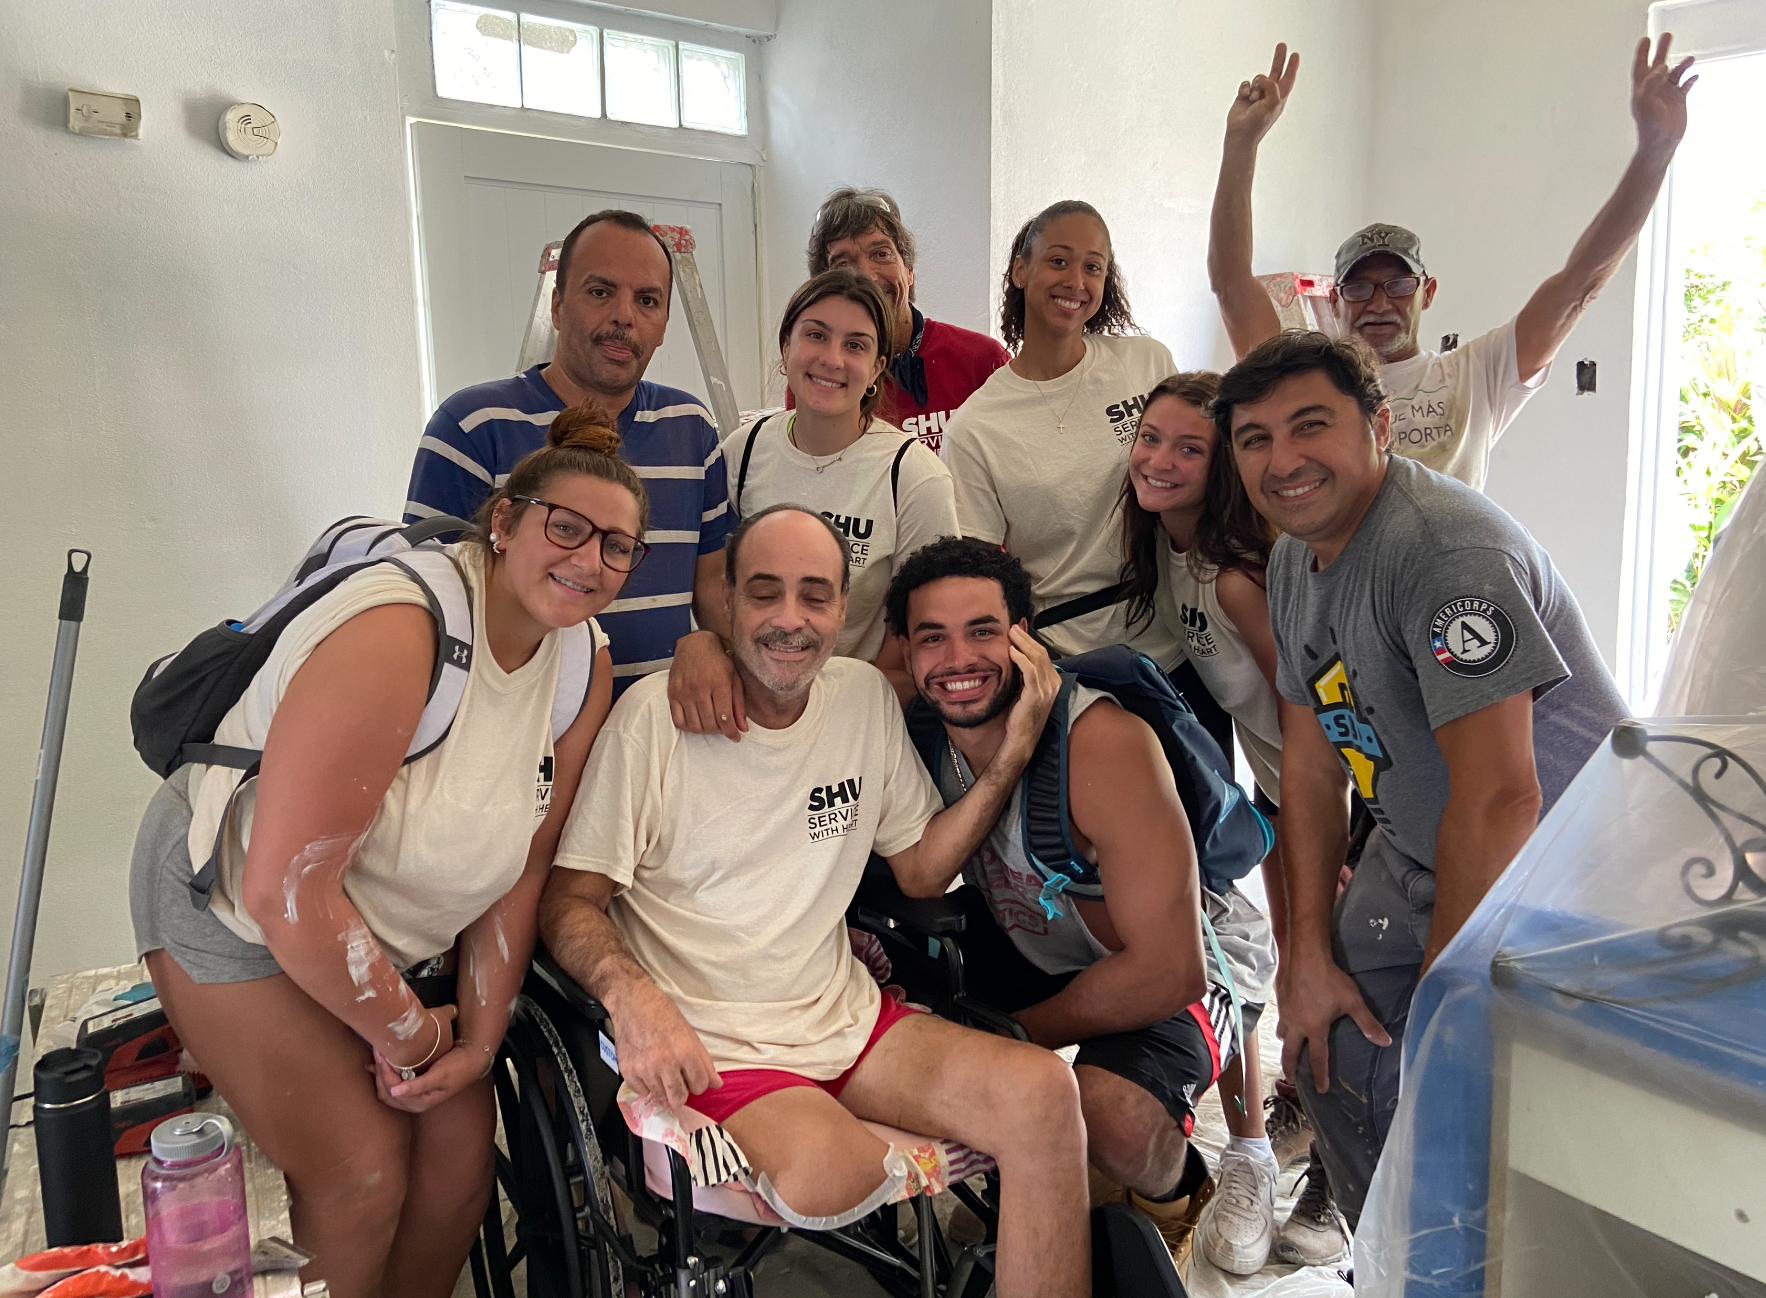 Summer Program - Promoting Volunteerism | NetWork Volunteers: Shared Service Experience Program